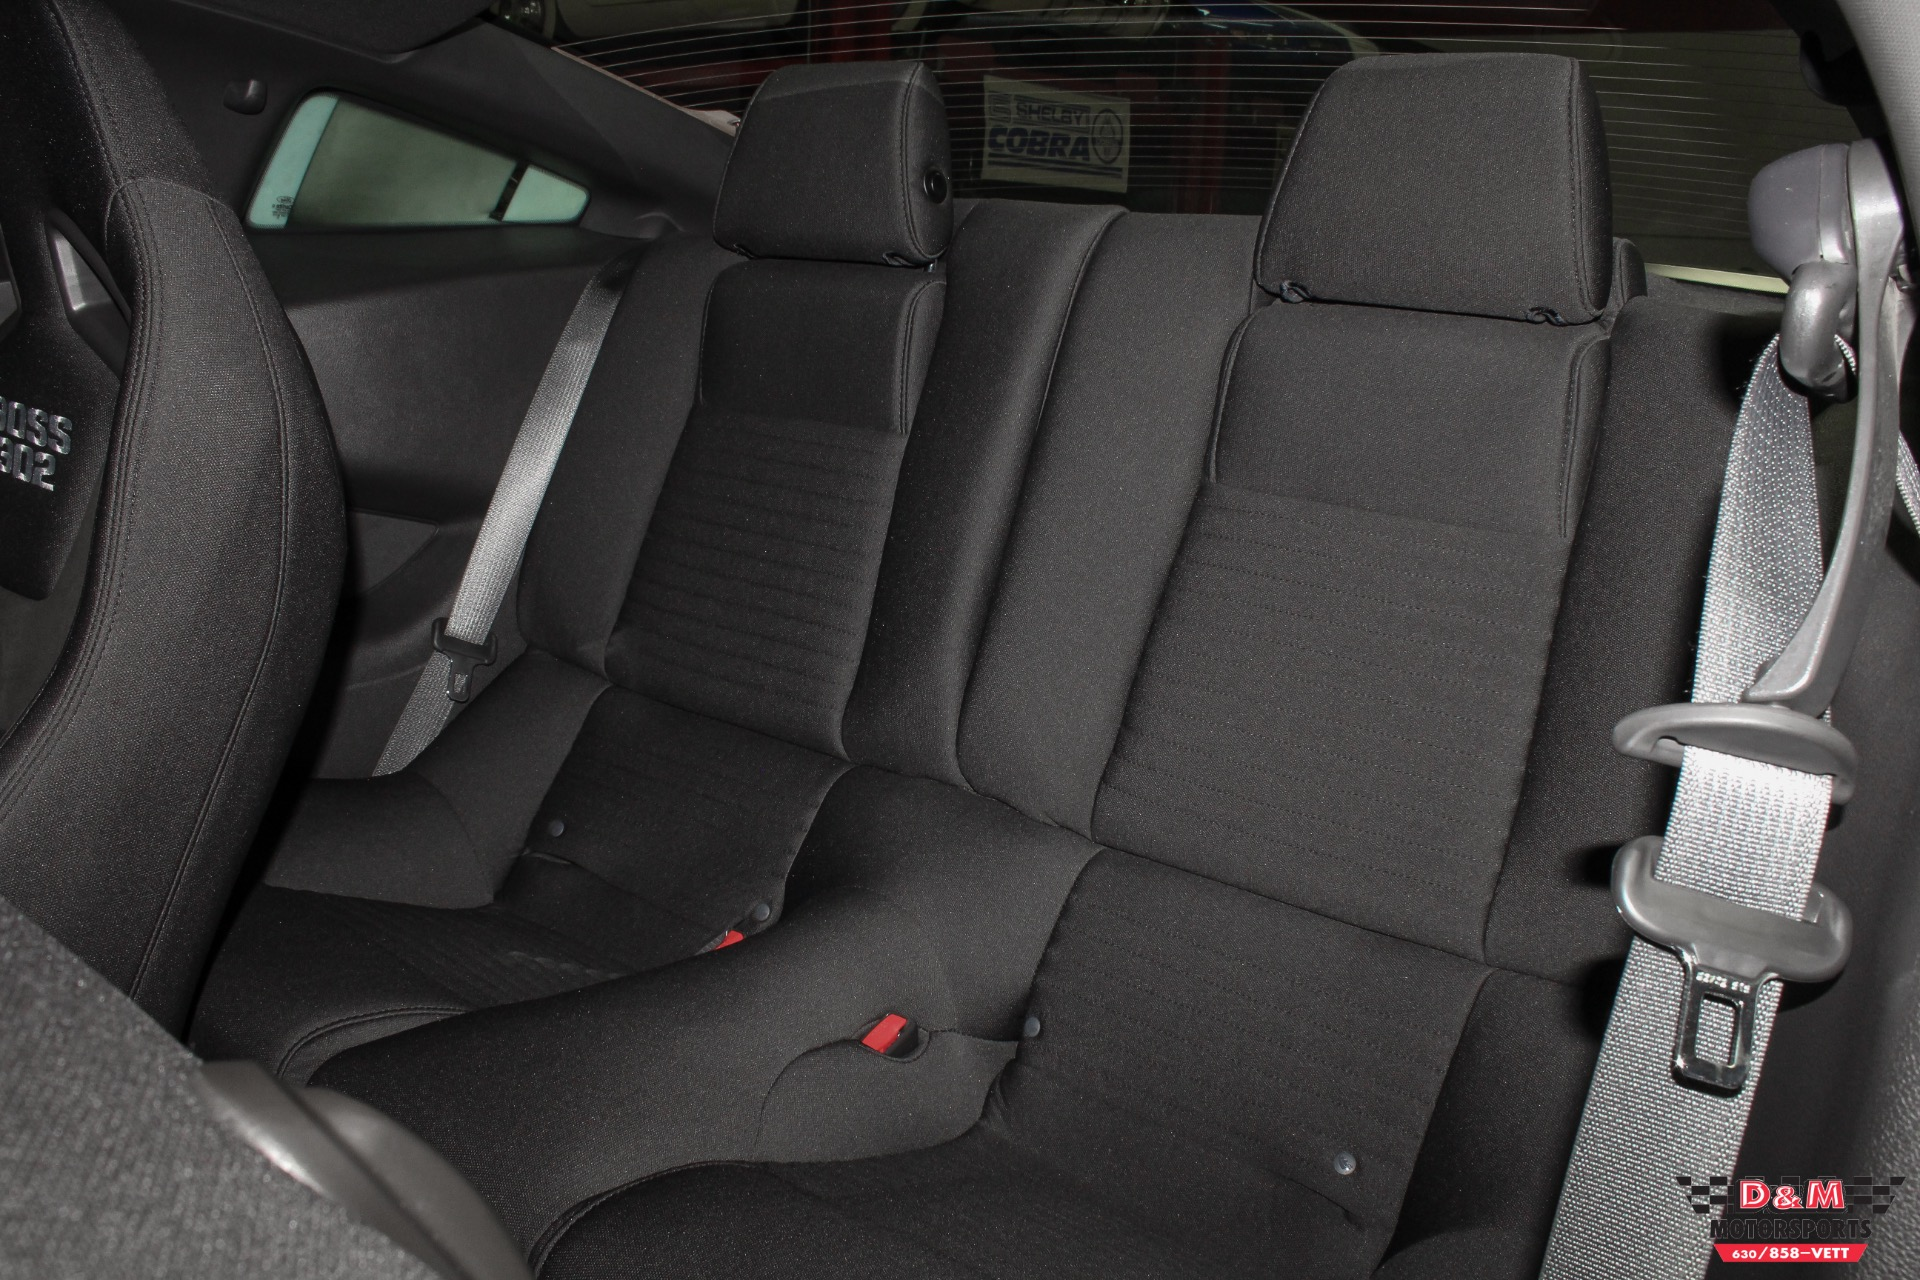 2013 Ford Mustang Boss 302 Stock # M6637 for sale near Glen Ellyn